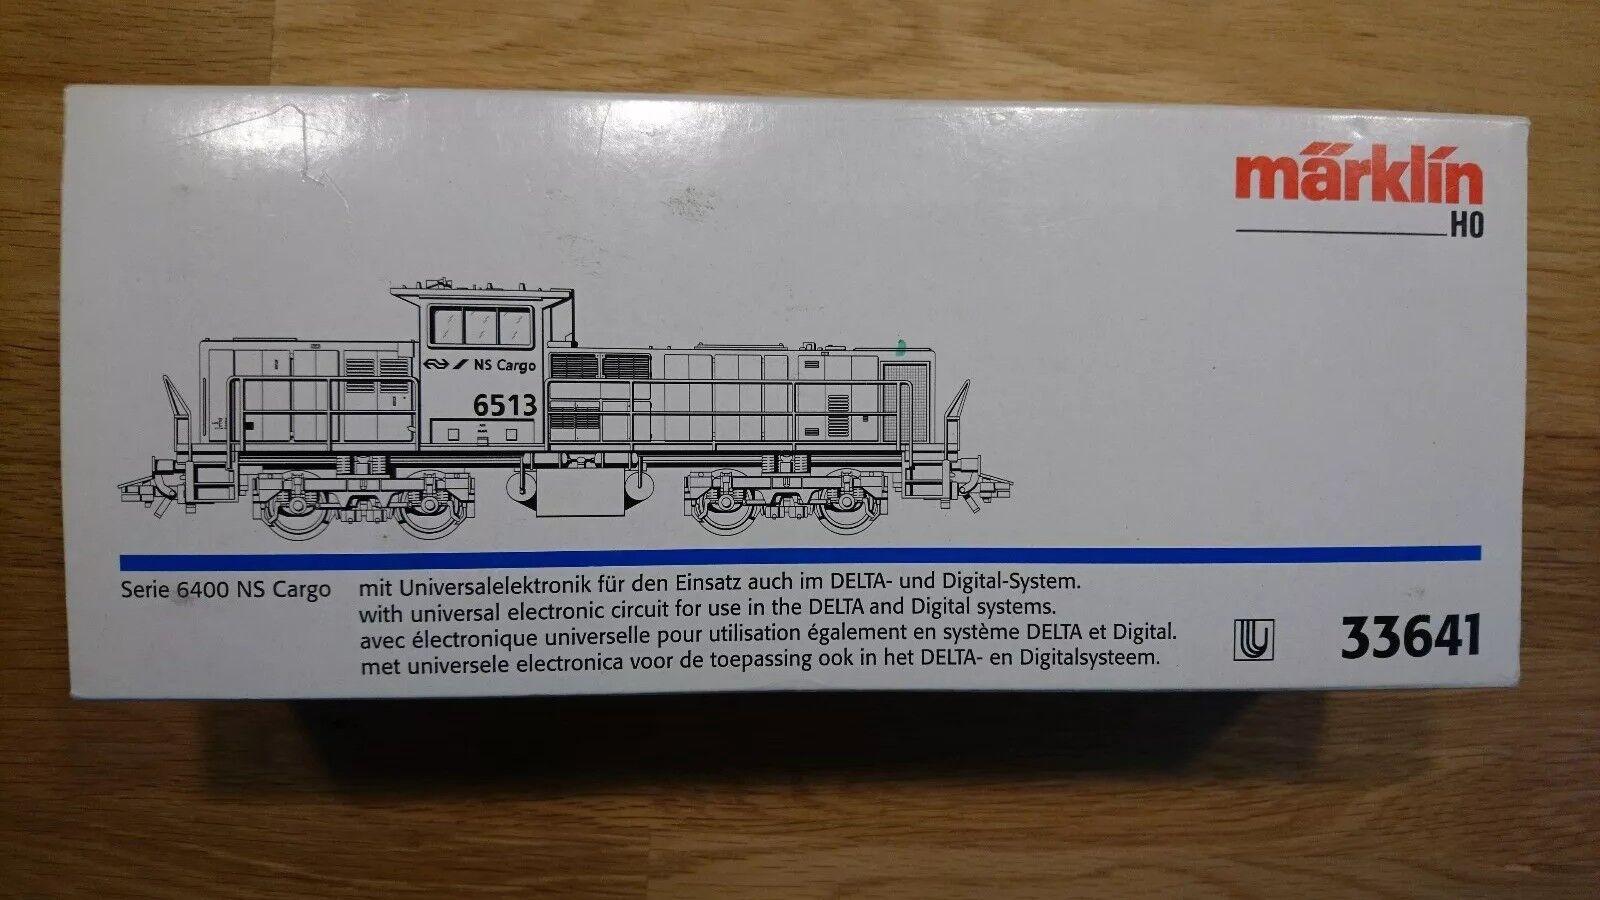 Märklin Diesellok 33641 H0 Serie 6400 NS Cargo 6513  | Verrückter Preis